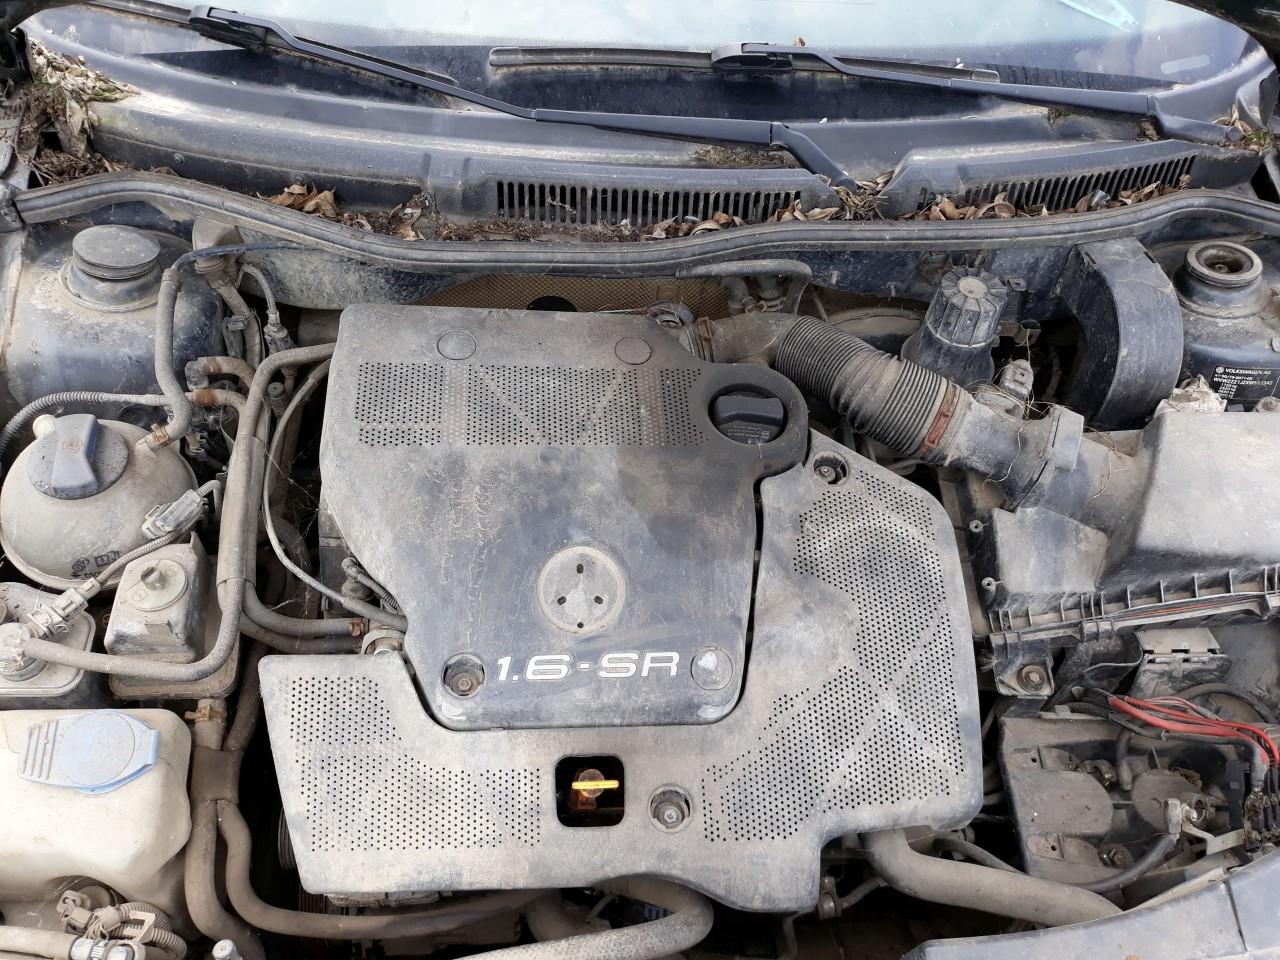 dezmembrari dezmembrez vw bora an 1999 motor 1,6 sr cod motor akl